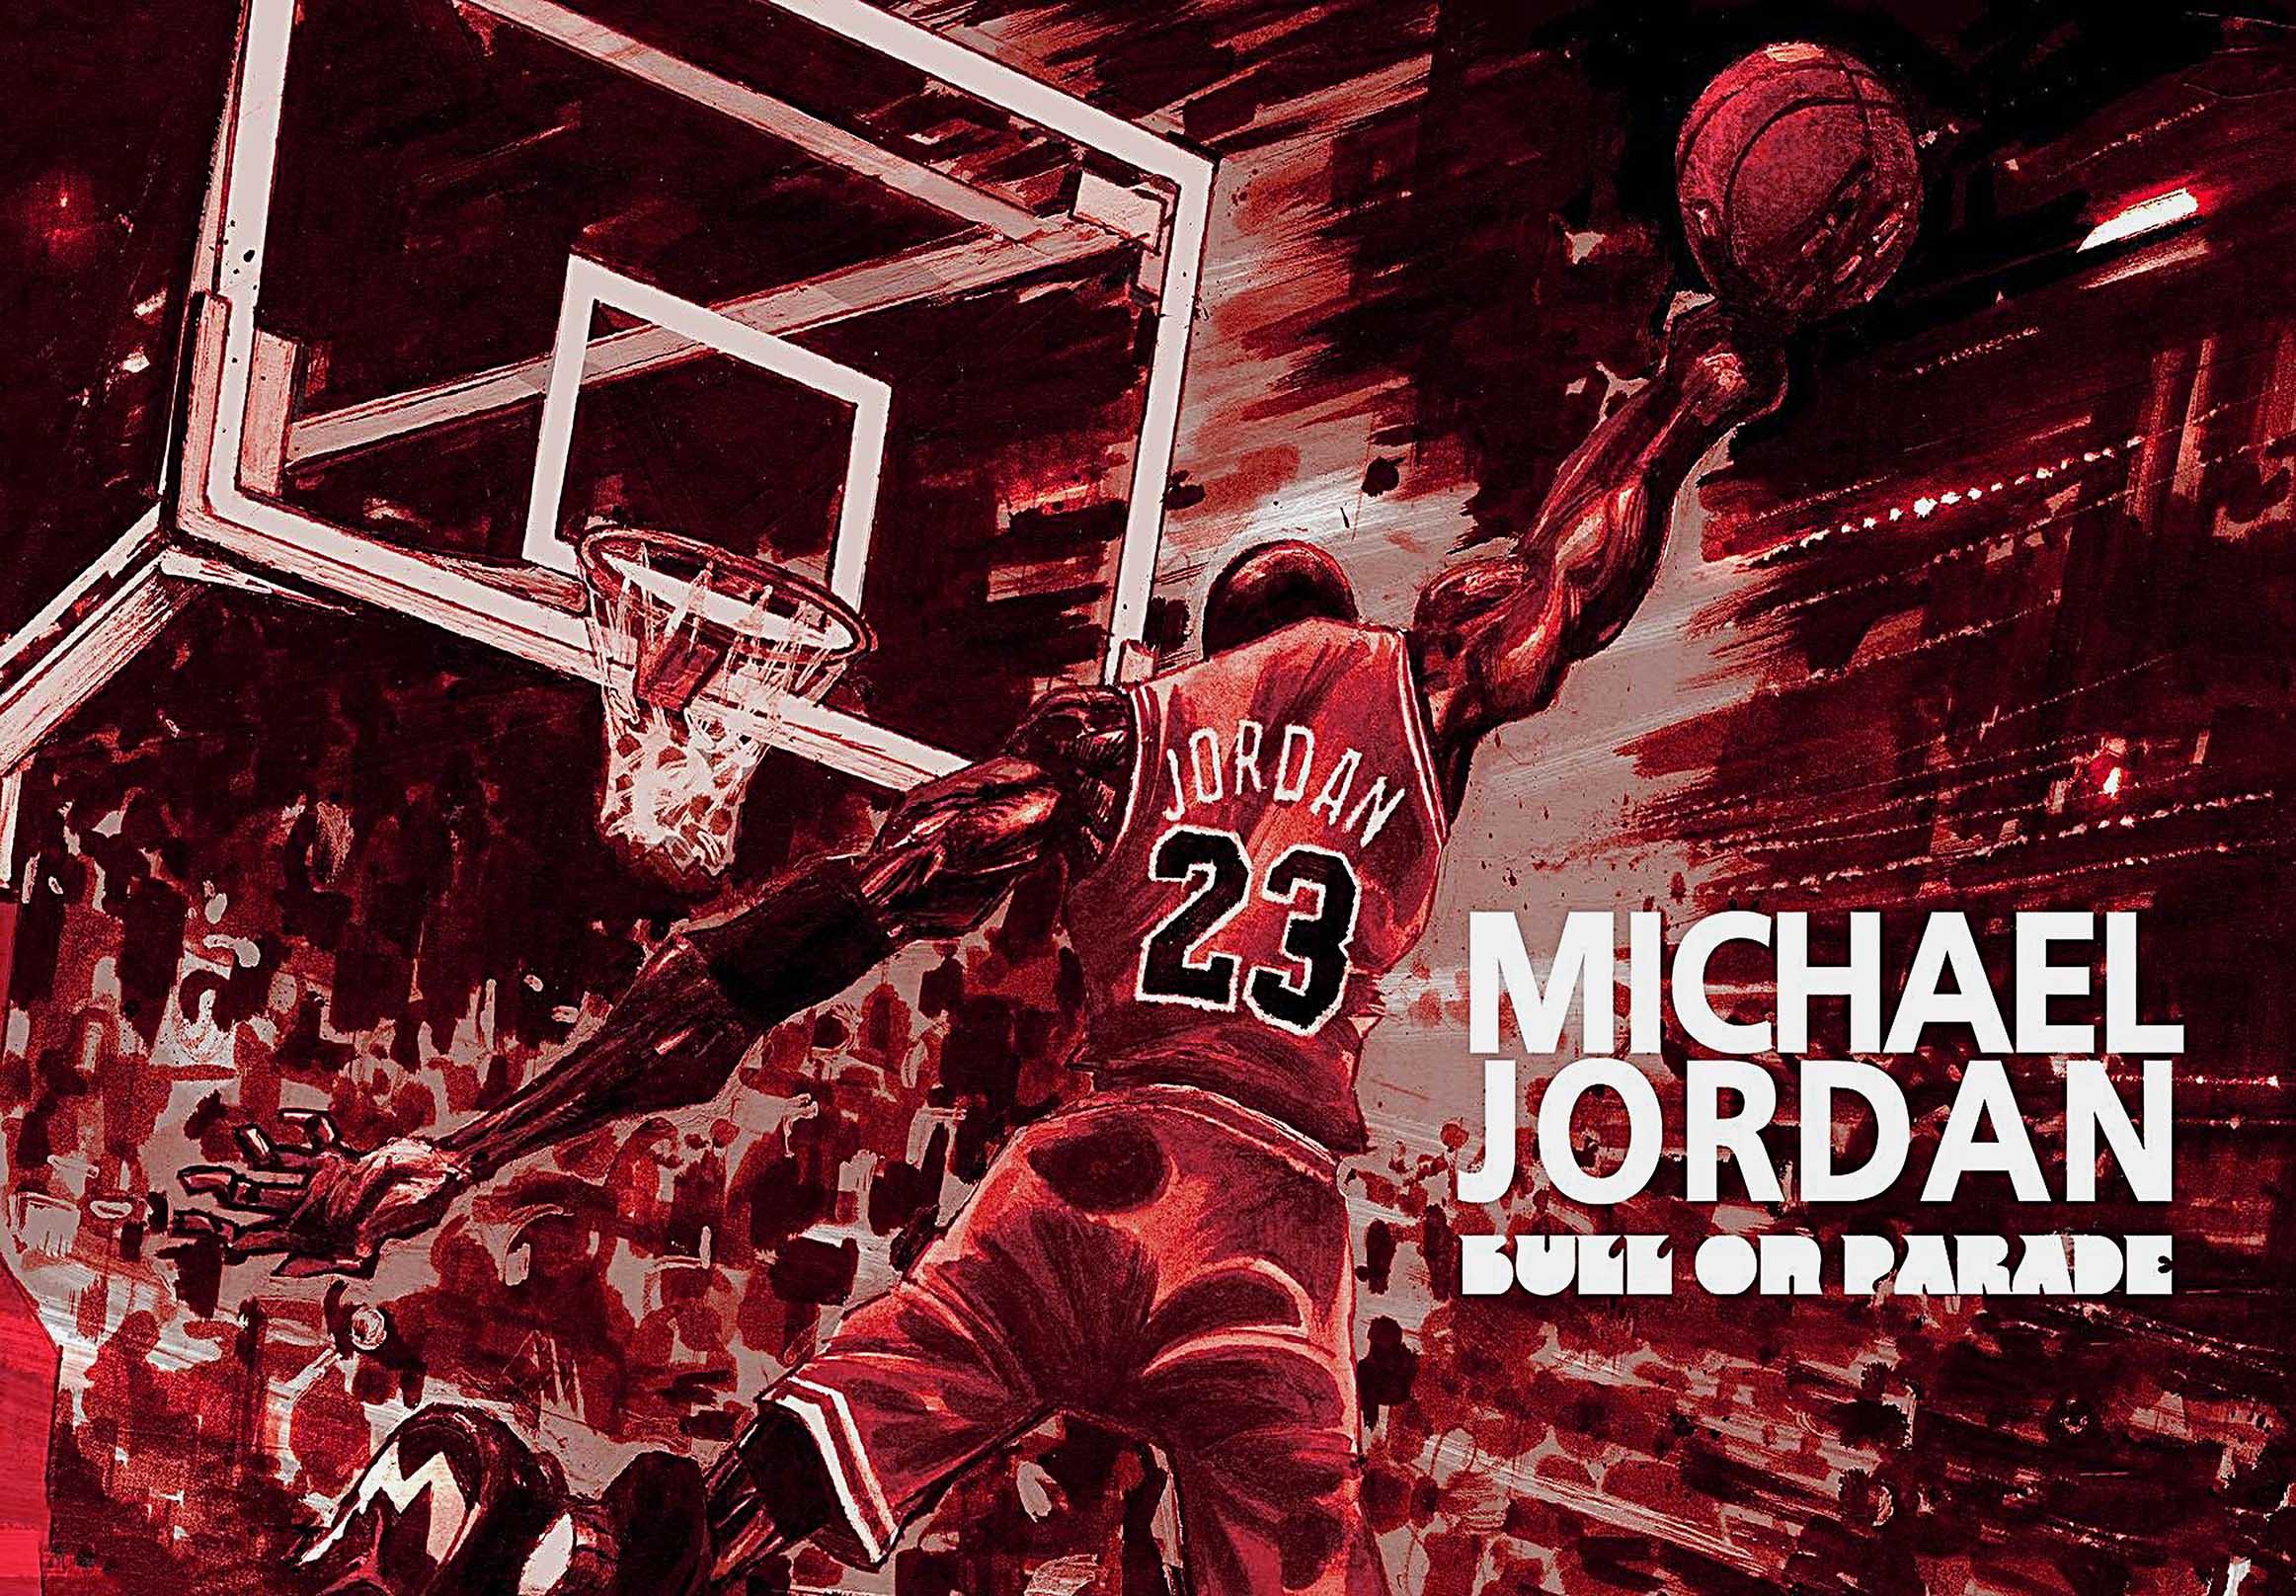 Michael Jordan Canvas Tablo (Nba-canvas-jordanmj1)